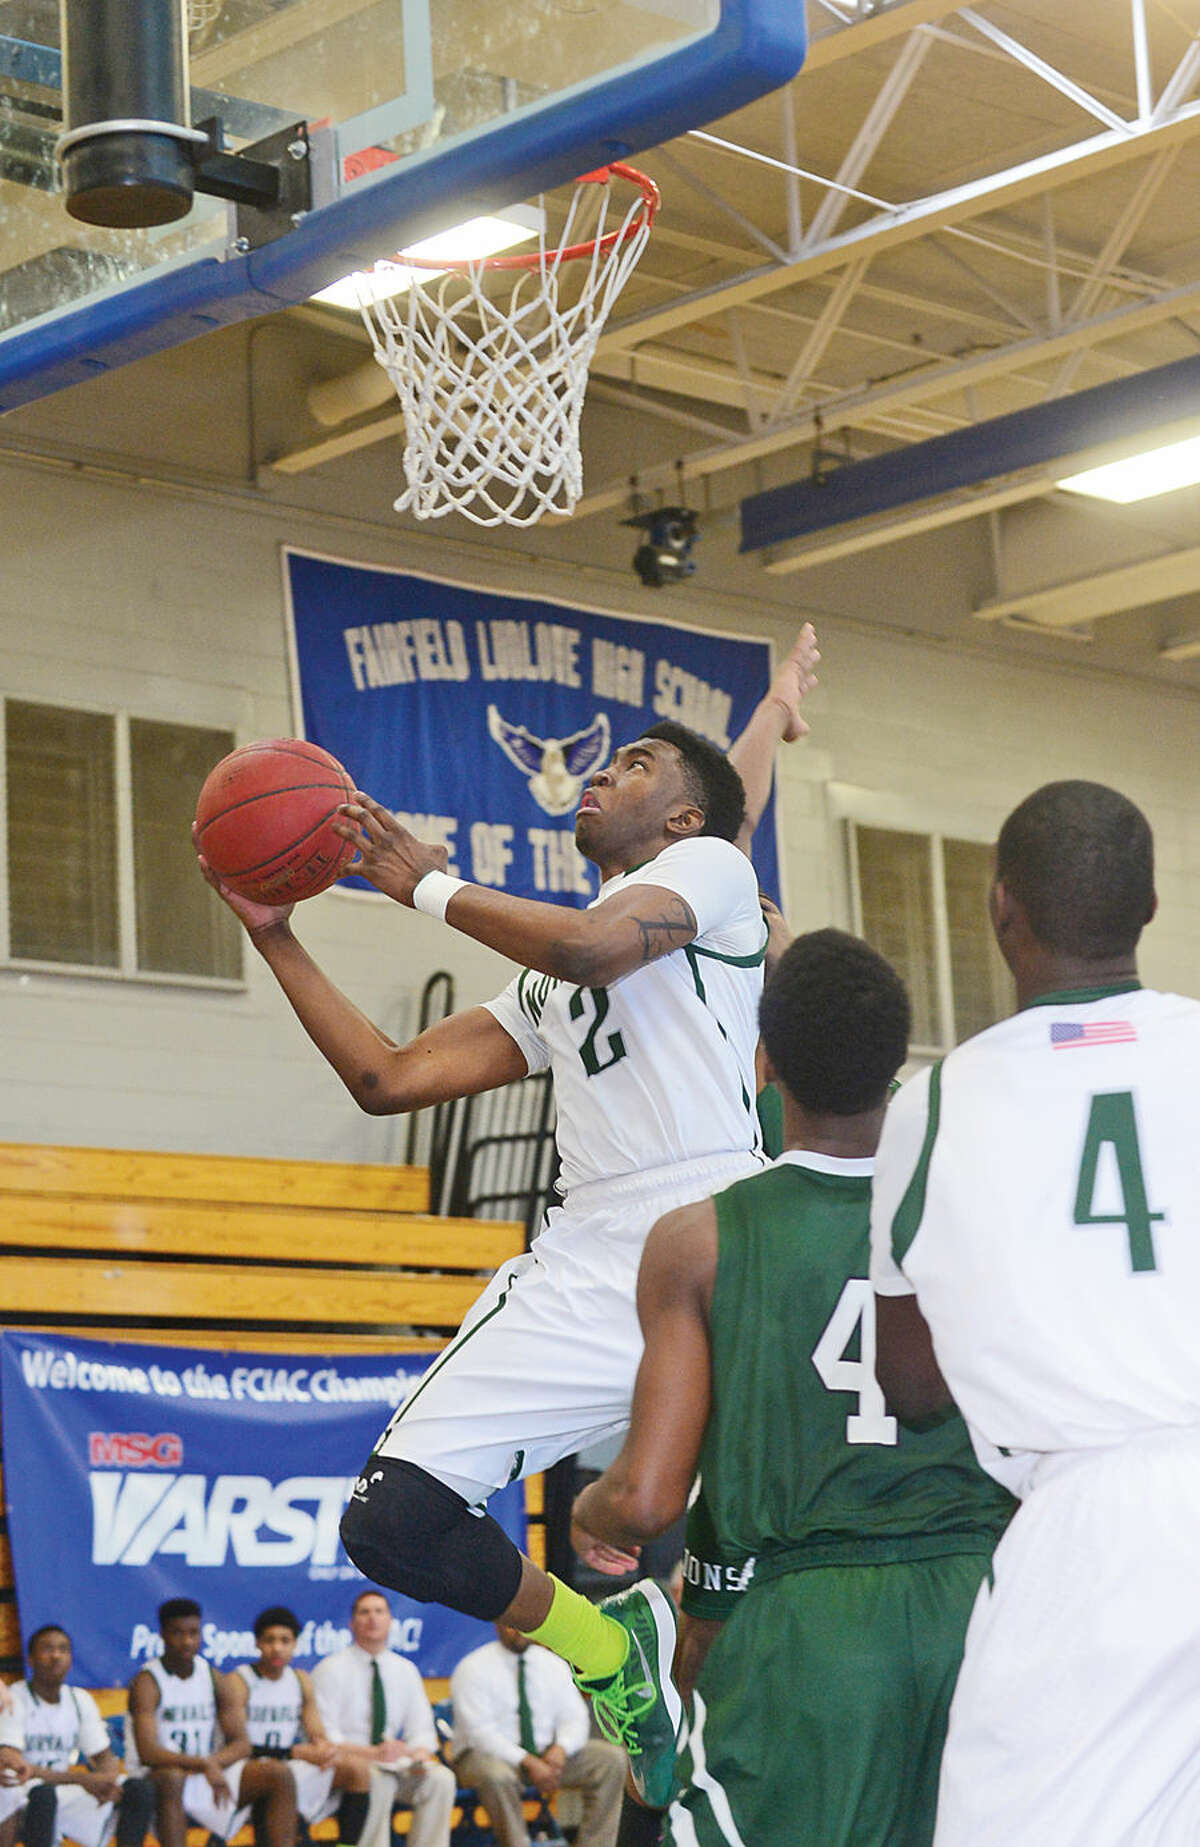 Hour photo / Erik Trautmann Norwalk takes on Bassick in their FCIAC Boys Basketball Quarterfinal Saturday at Fairfield Ludlowe High School.